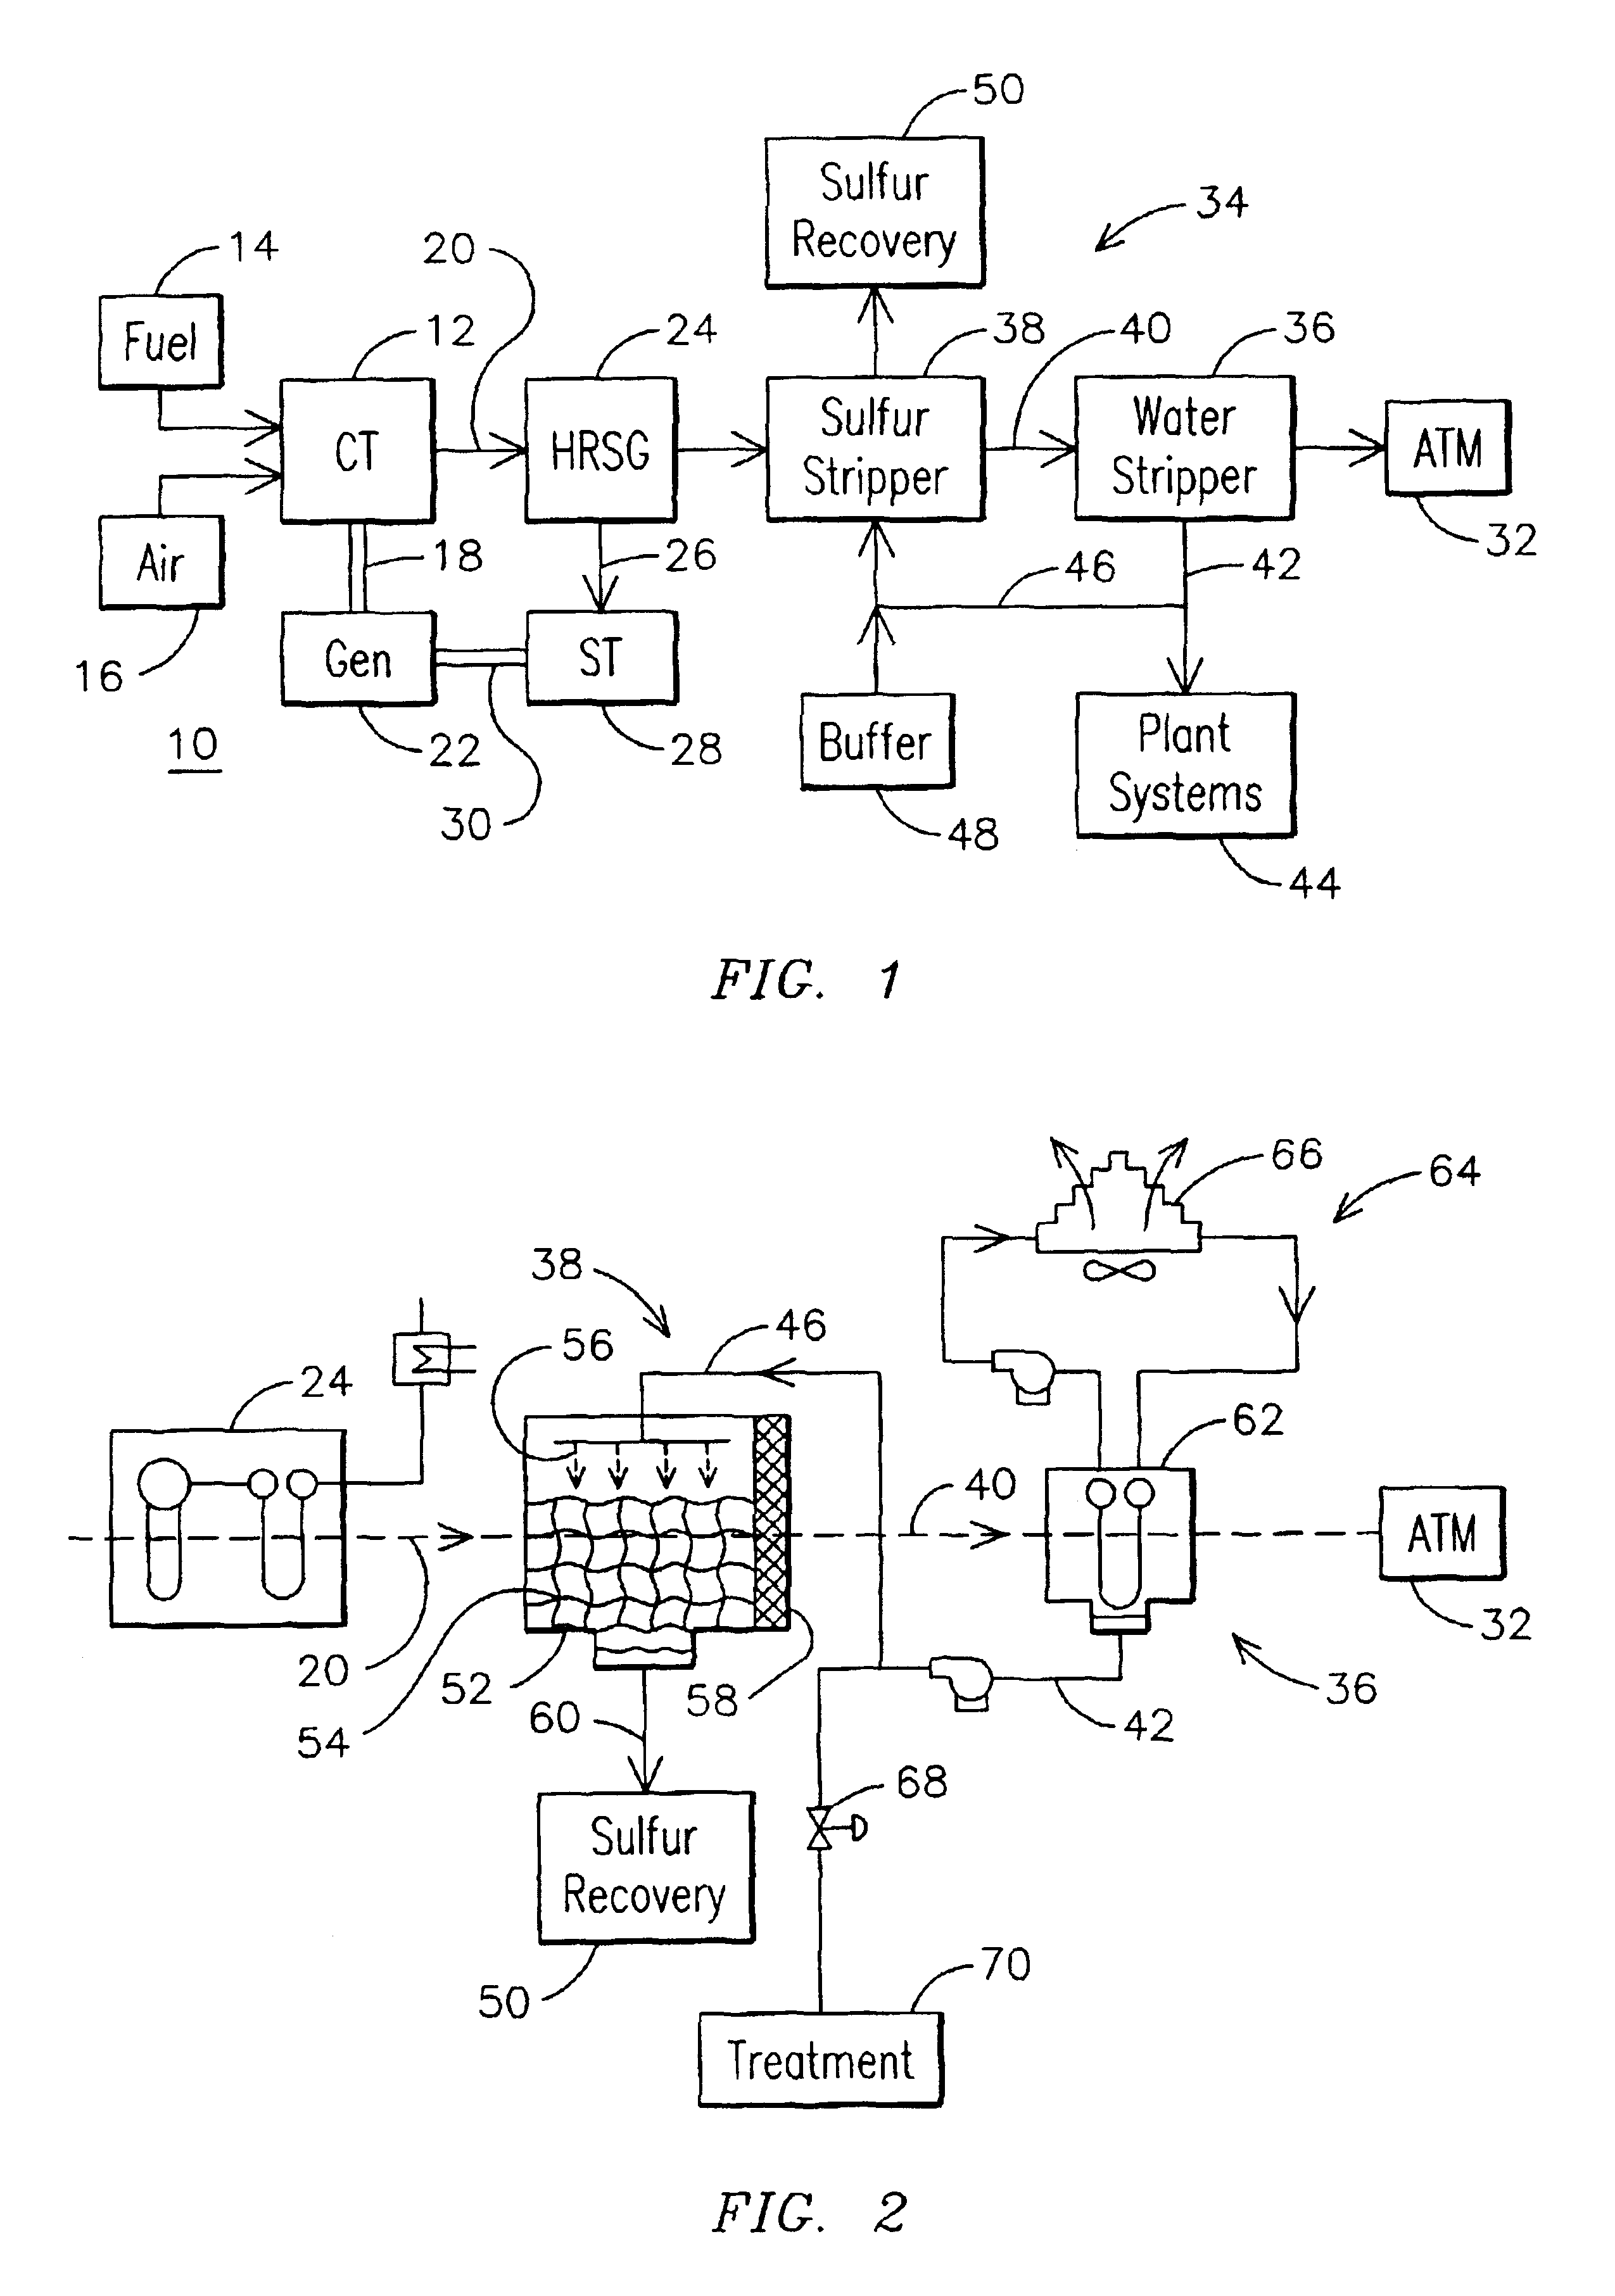 robinair ac unit wiring diagram bryant ac unit wiring diagram [diagram] 34988 robinair ac unit wiring diagram full ...